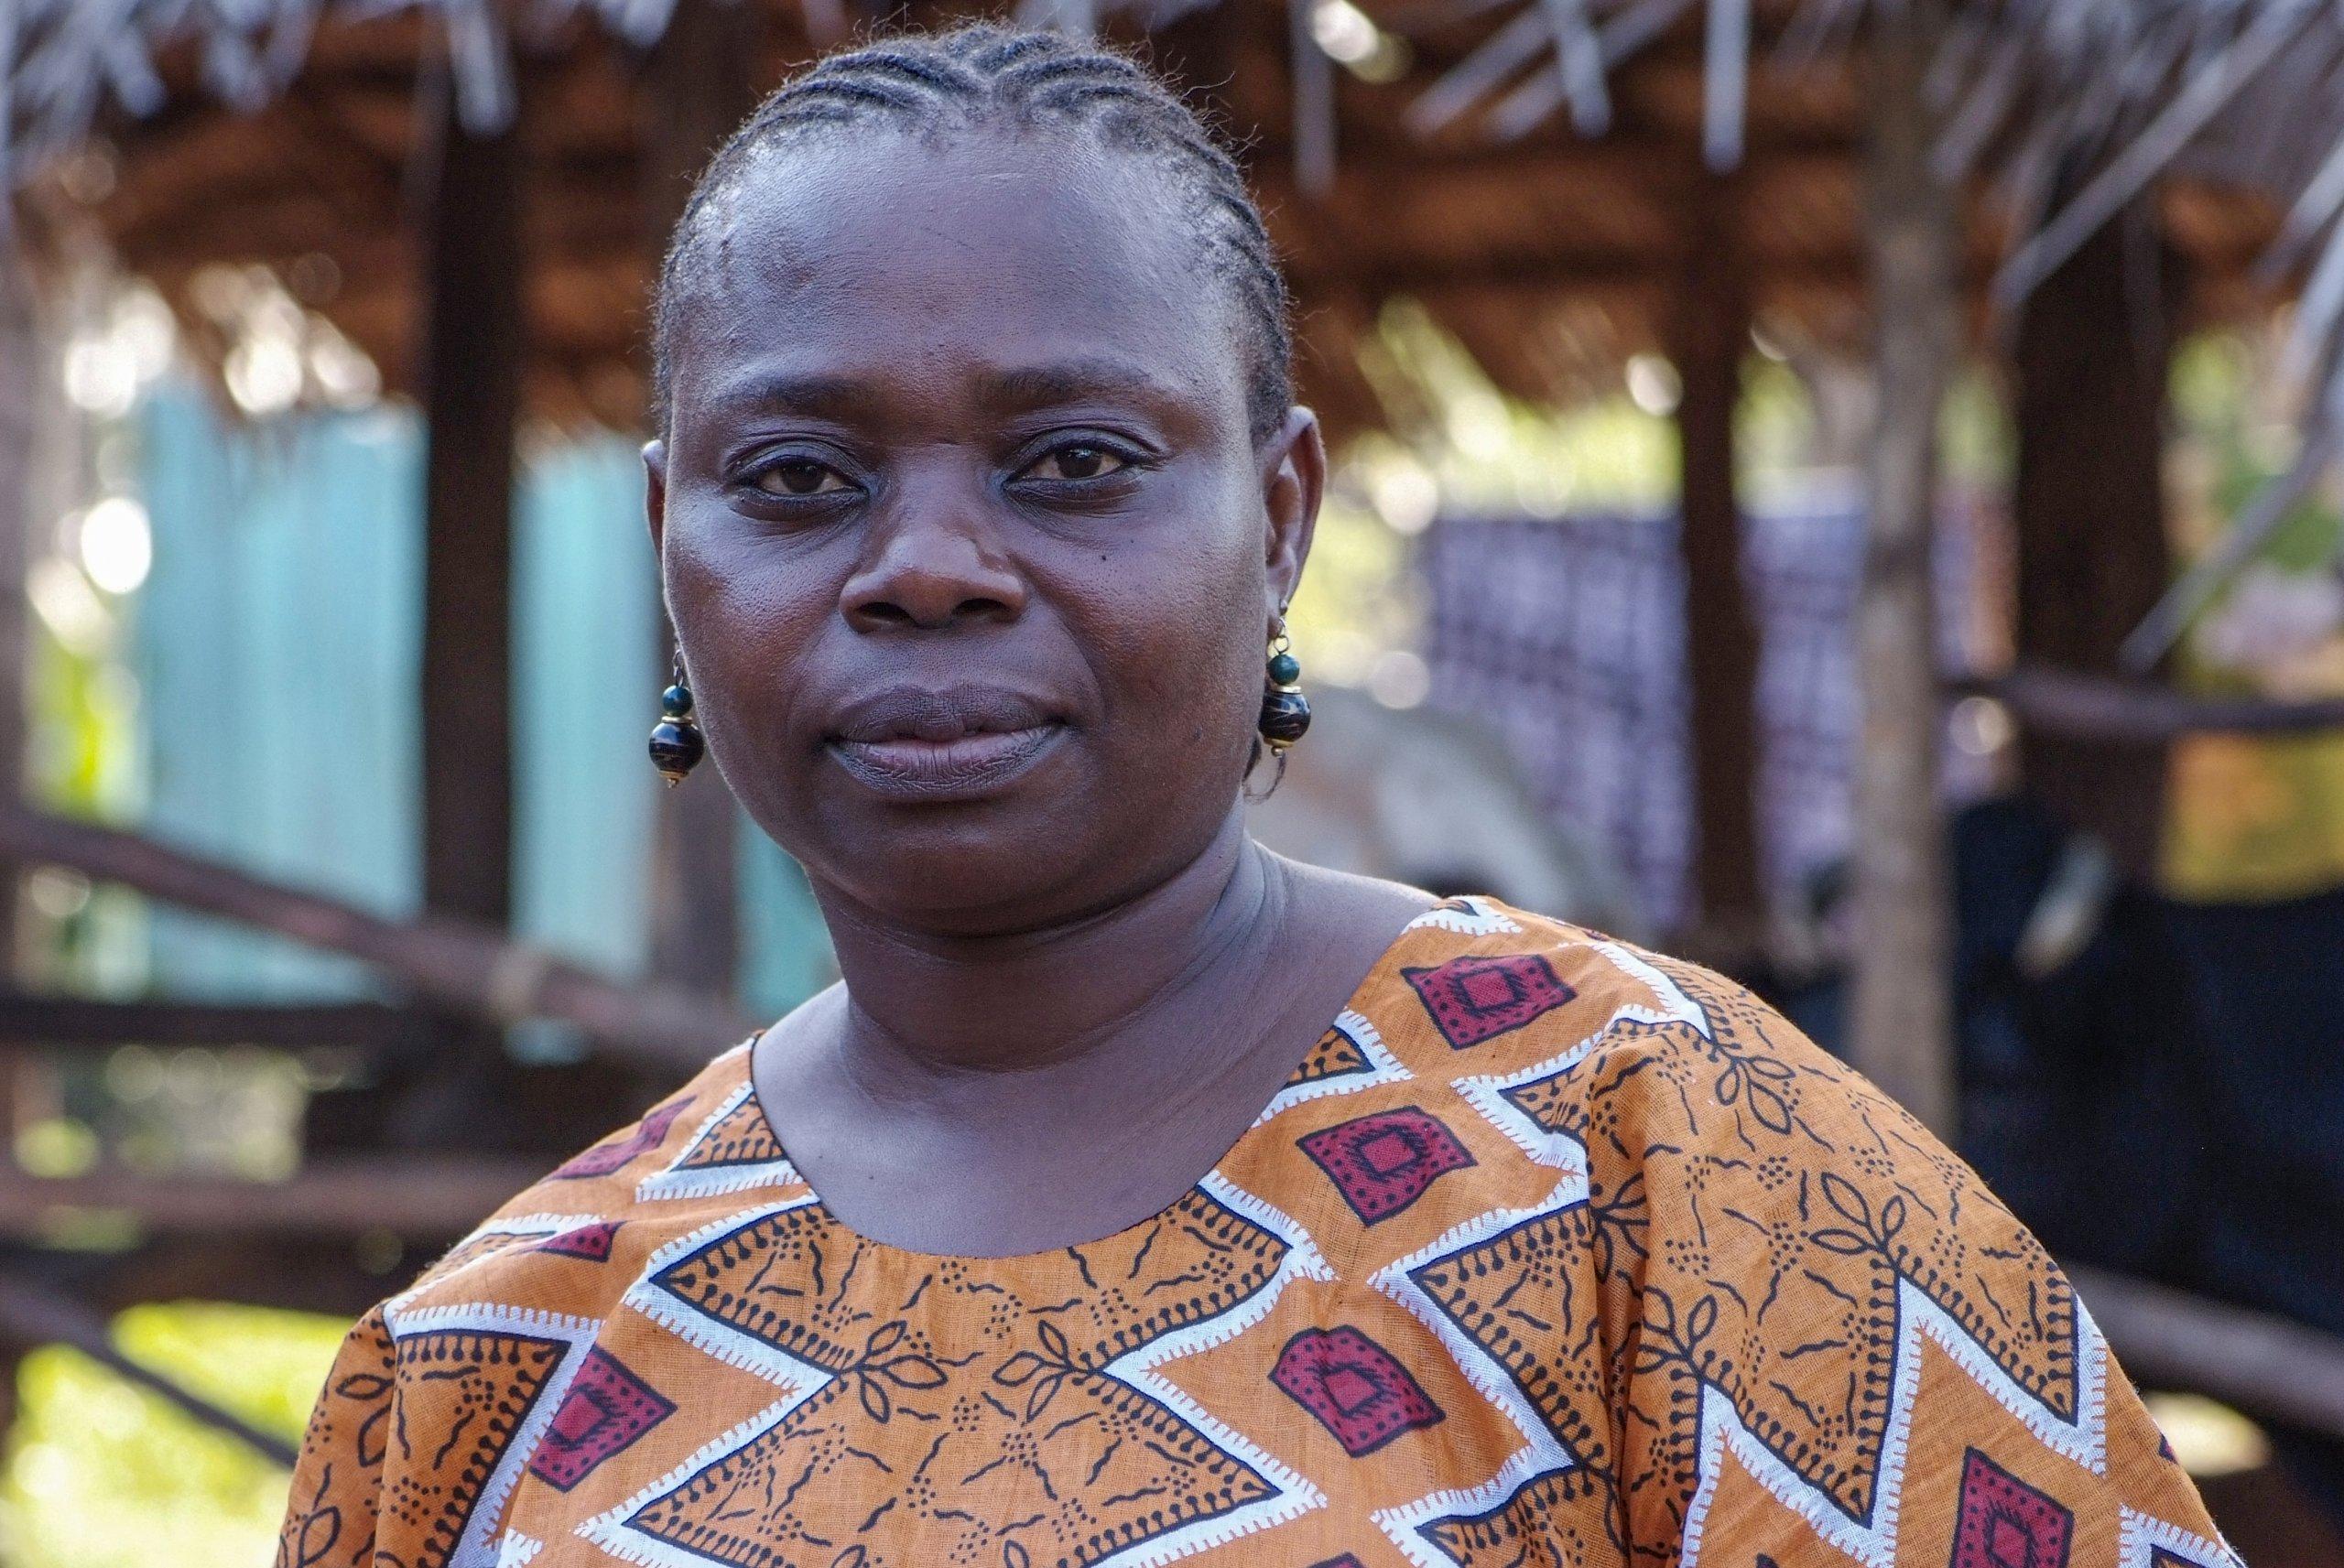 30 03 boerin trotsevrouw Tulafiwona Sanga Pangani Tanzania 5672 scaled